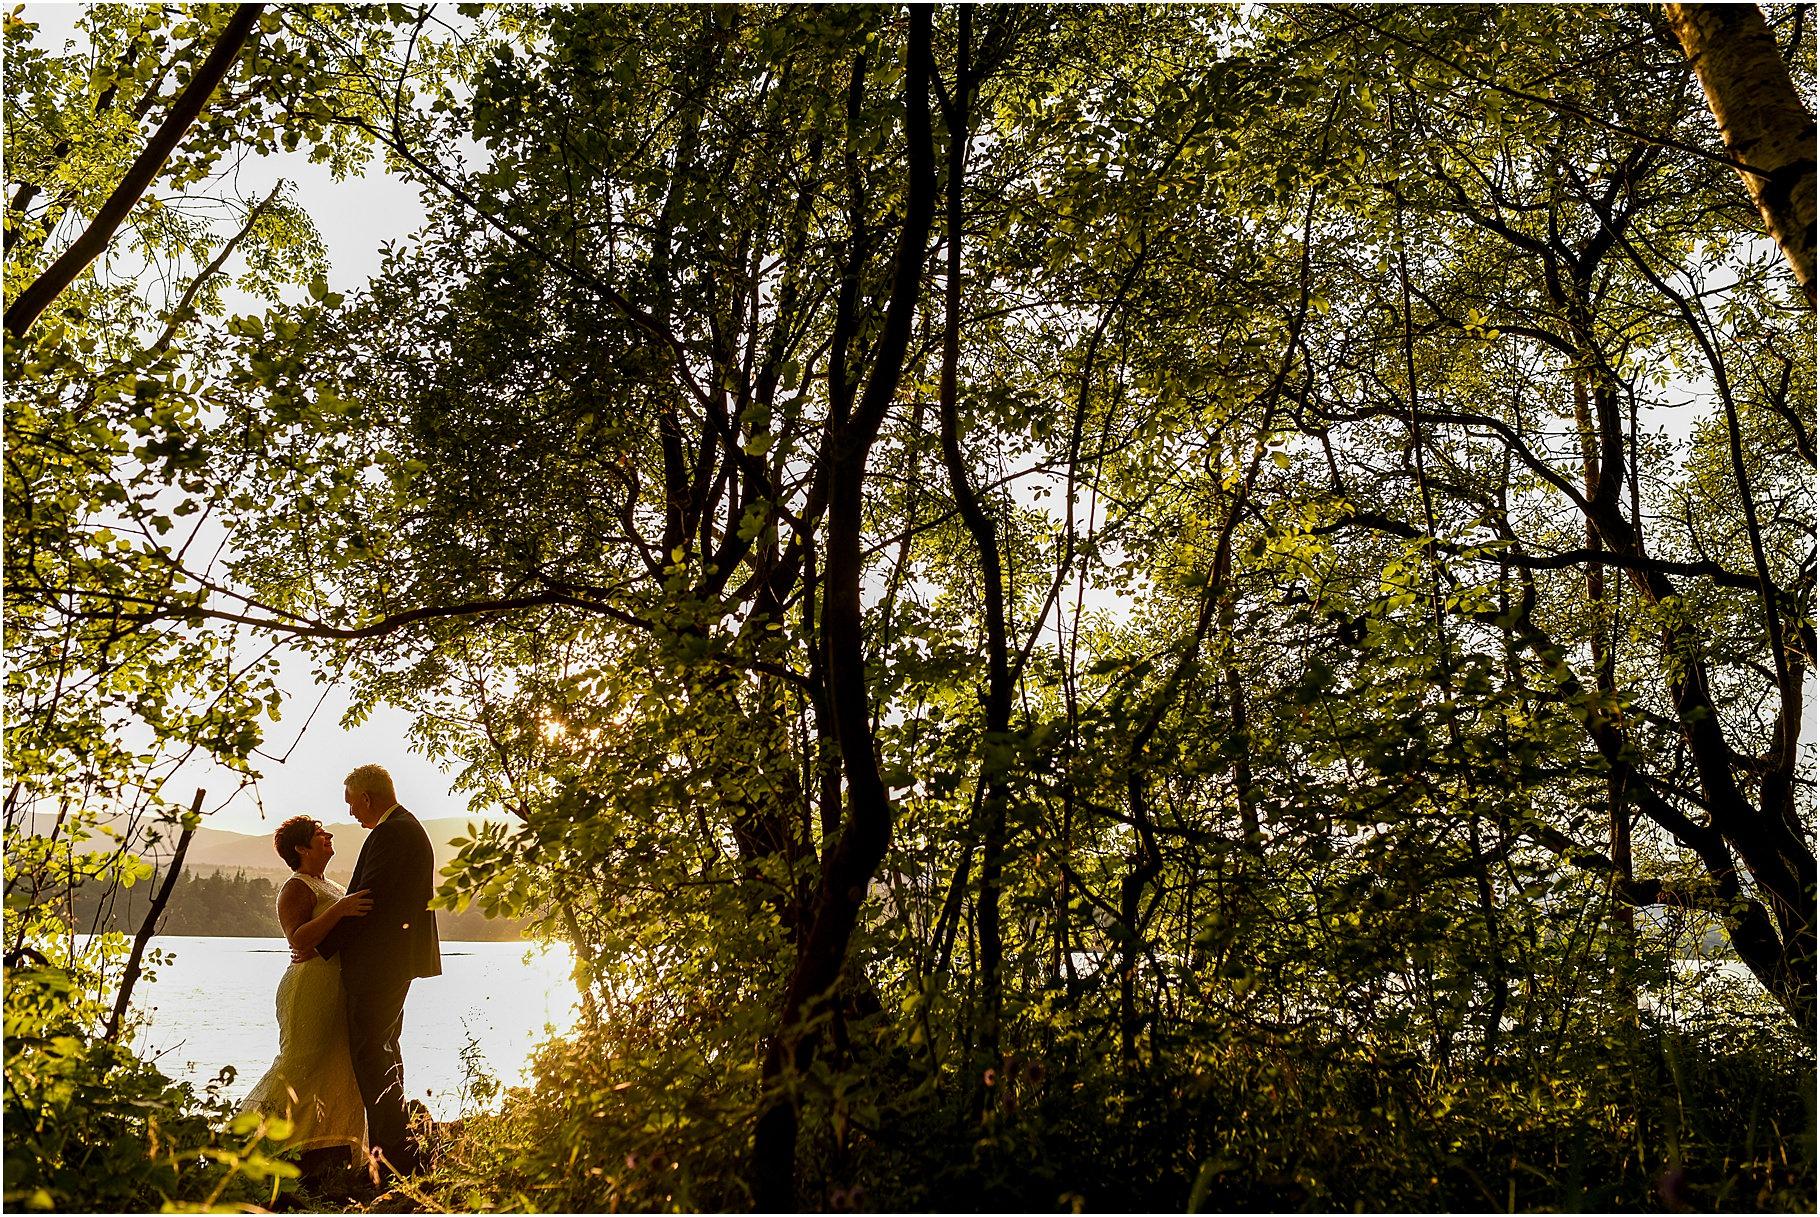 dan-wootton-photography-2017-weddings-110.jpg